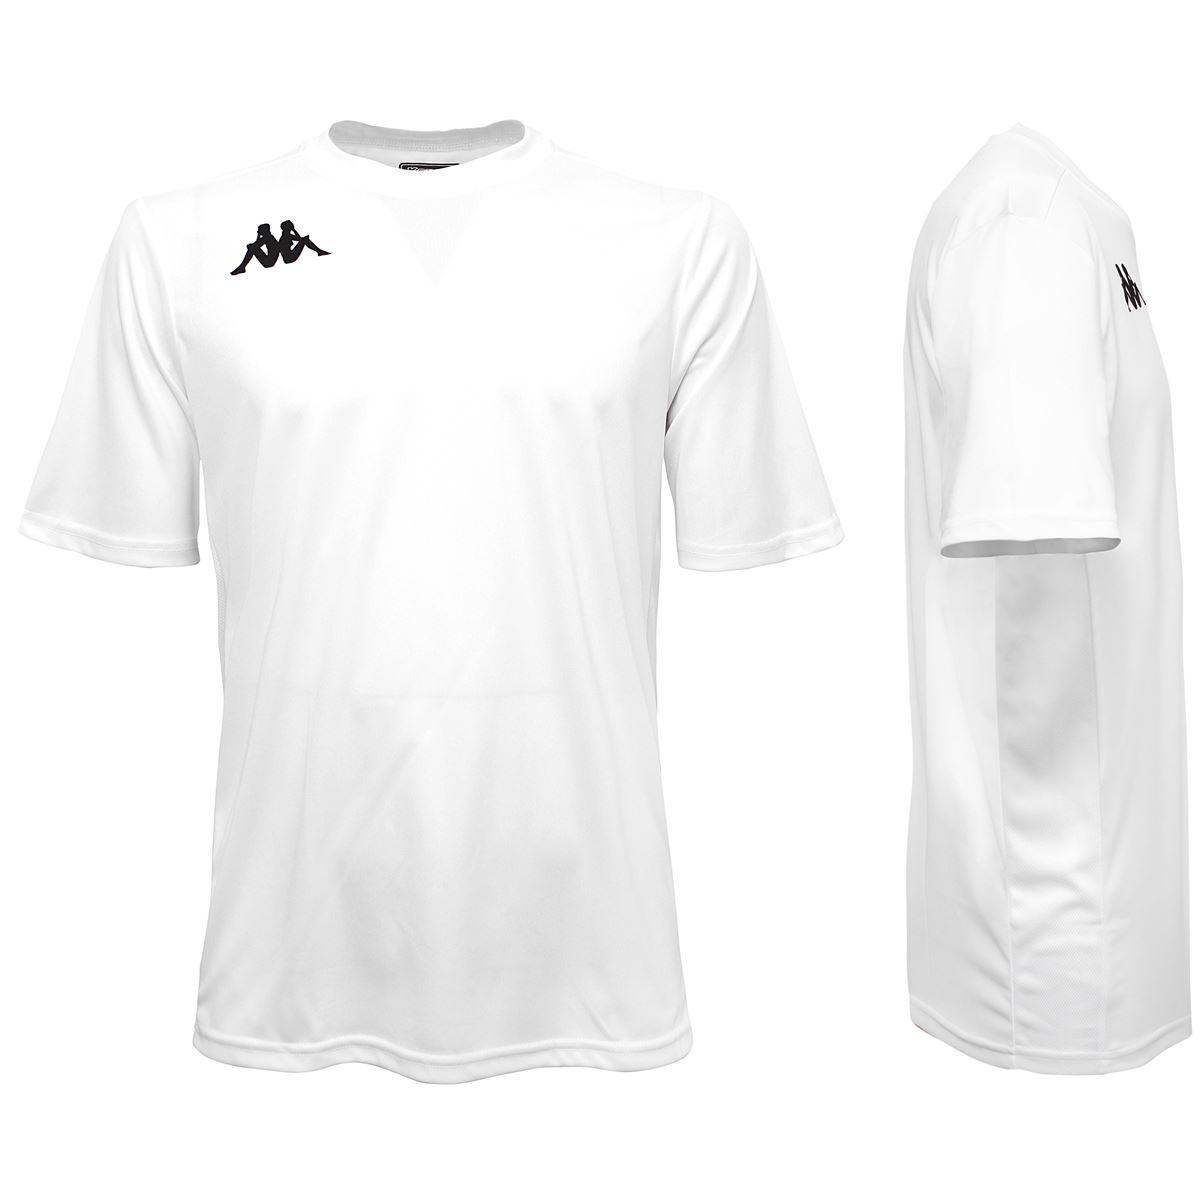 Kappa T-shirt sportiva KAPPA4SOCCER WENET Uomo Calcio sport Camicia